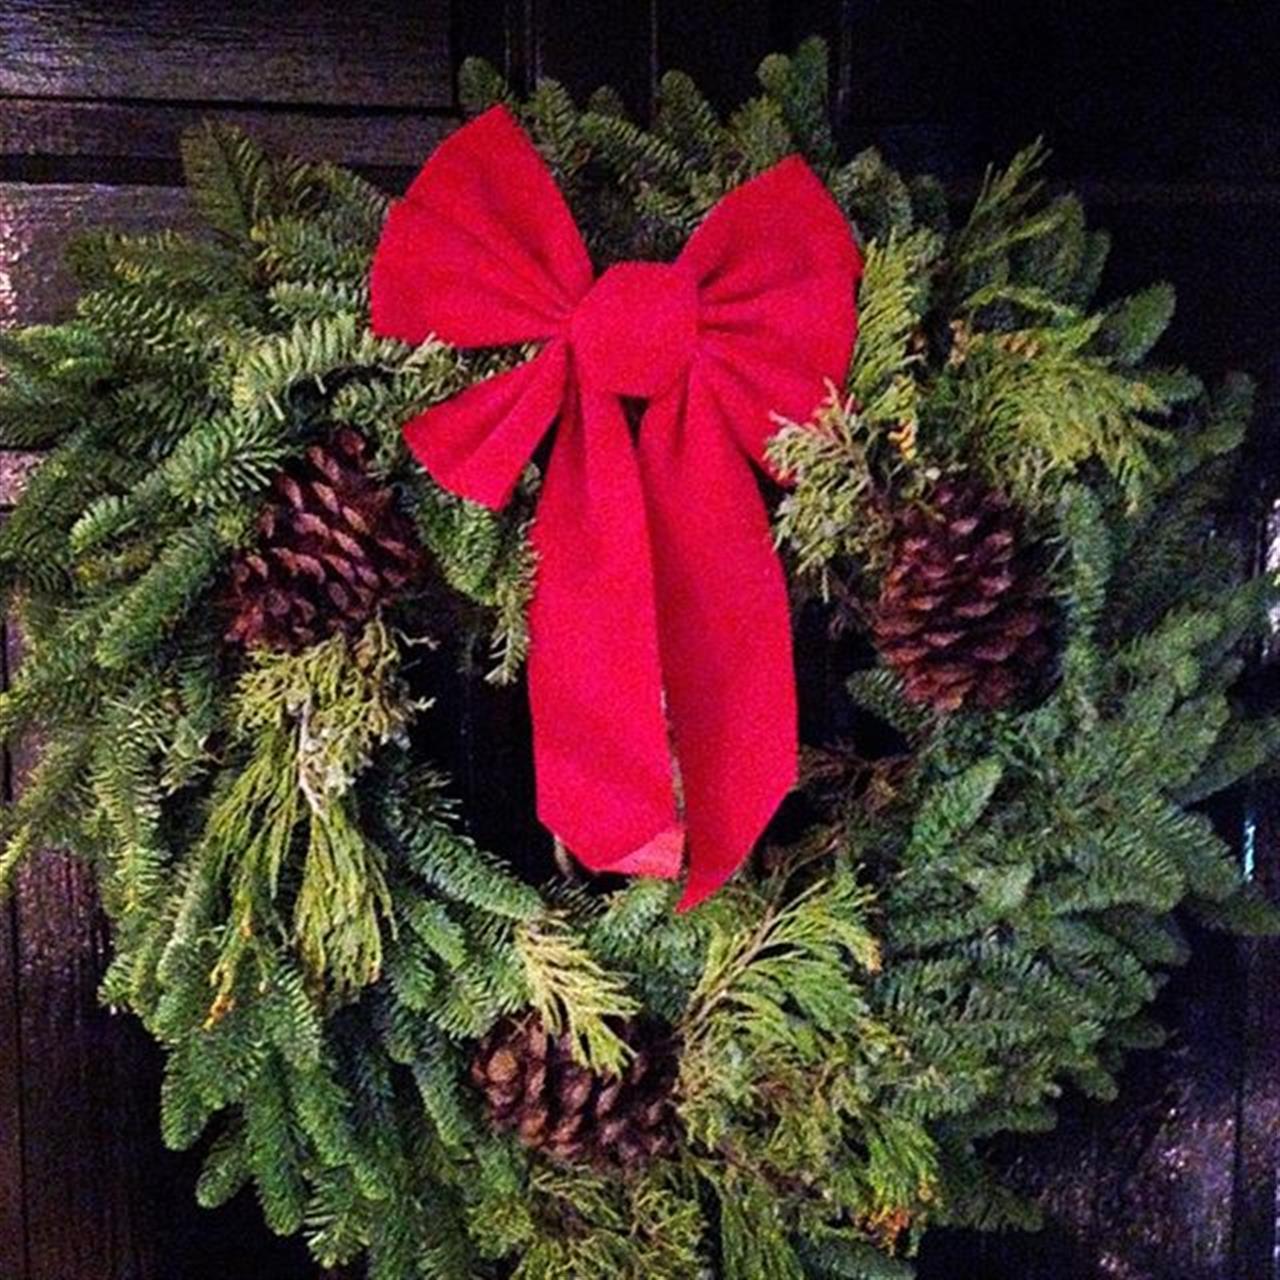 3 more days...!!!???????#bairdhalstead #montclairnj #glenridge#veronanj #christmas #halsteadproperty #exploreyourhood #leadingrelocal #realtor #realestate #realestateagent #brooklyn #parkslope #brooklynwest#maplewood #peace #family #joy